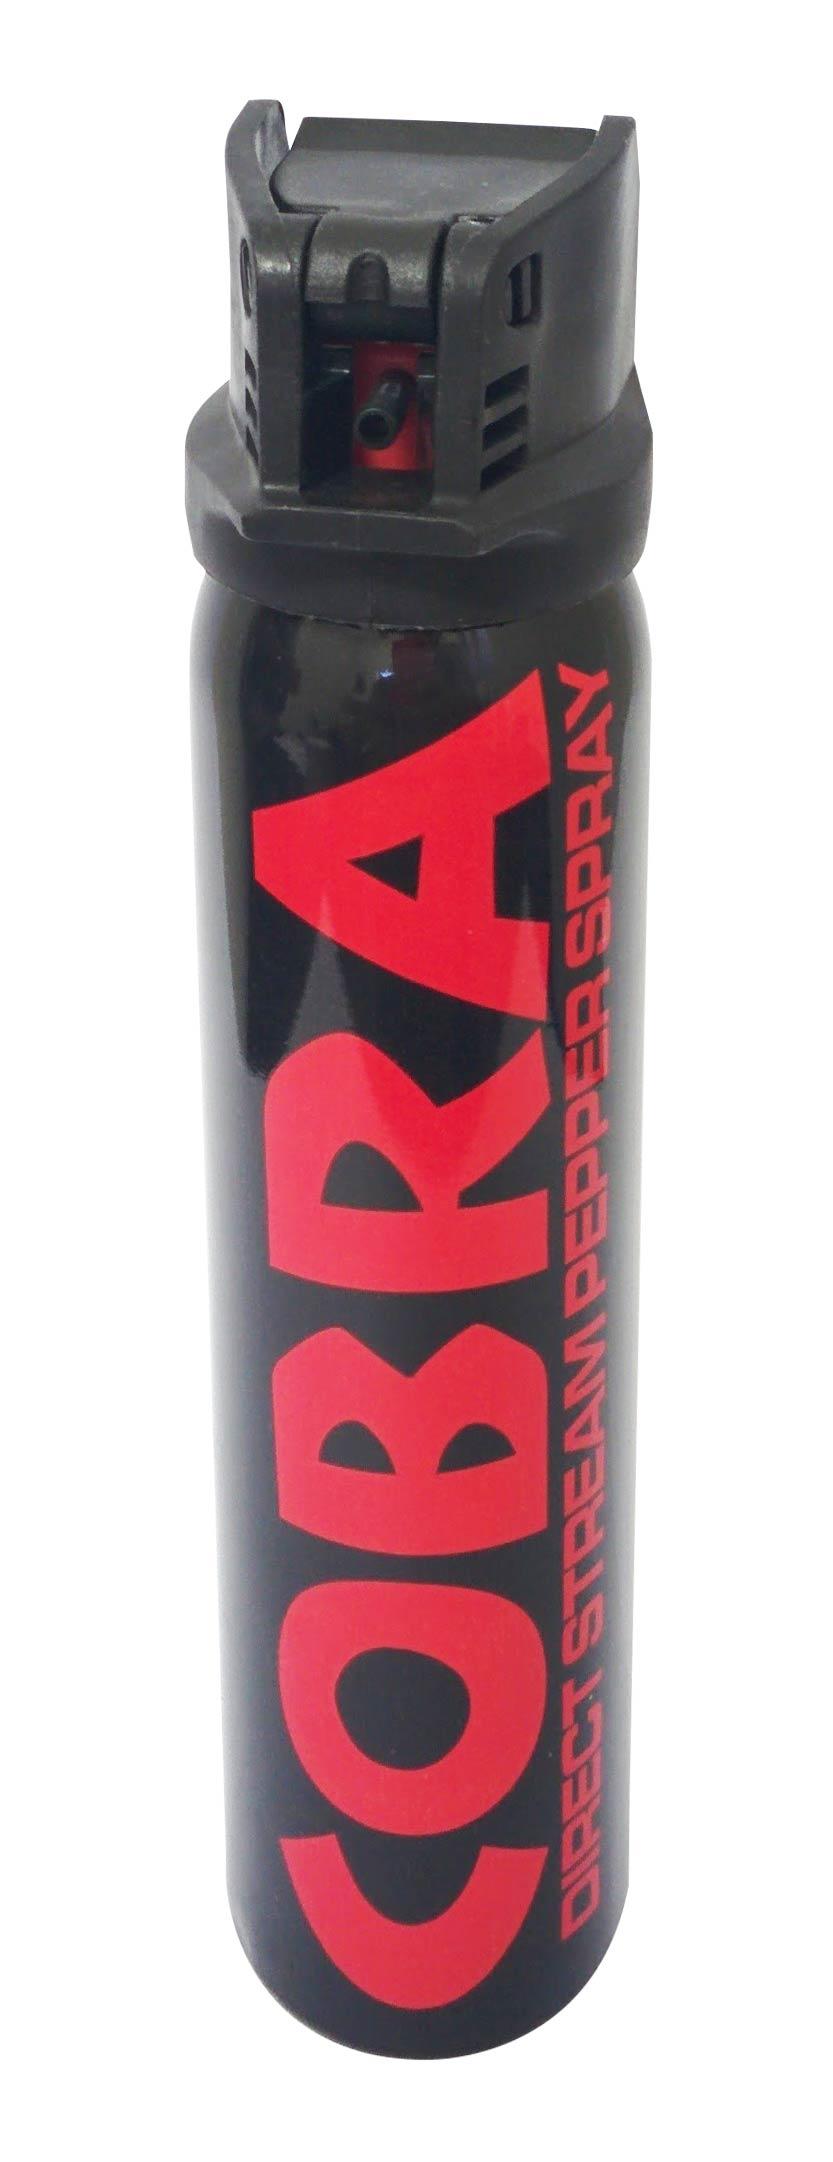 Cobra_PepperSpray.jpg